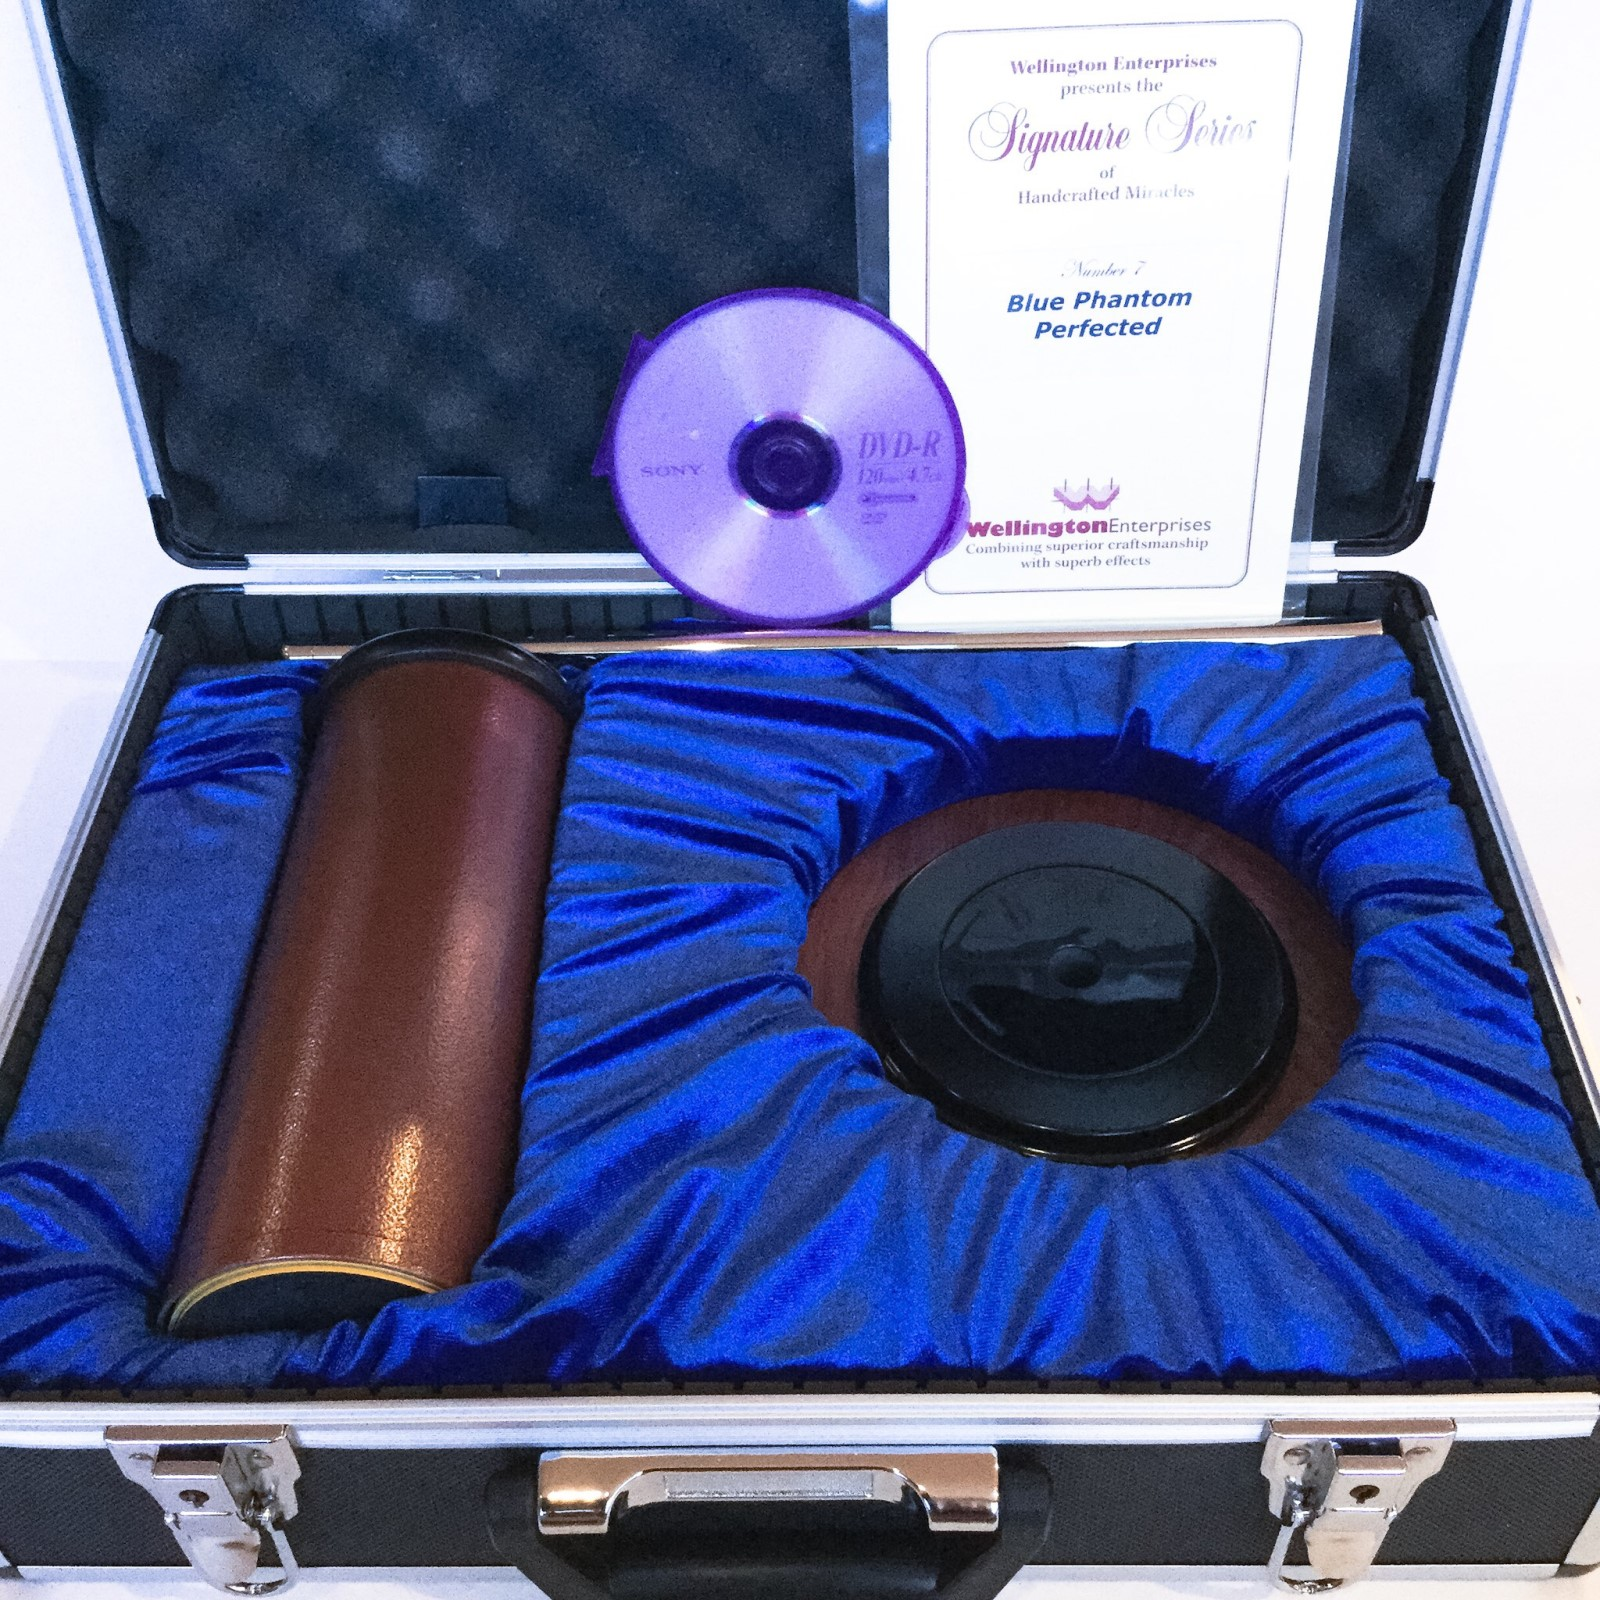 Blue Phantom Perfected by Wellington Enterprises